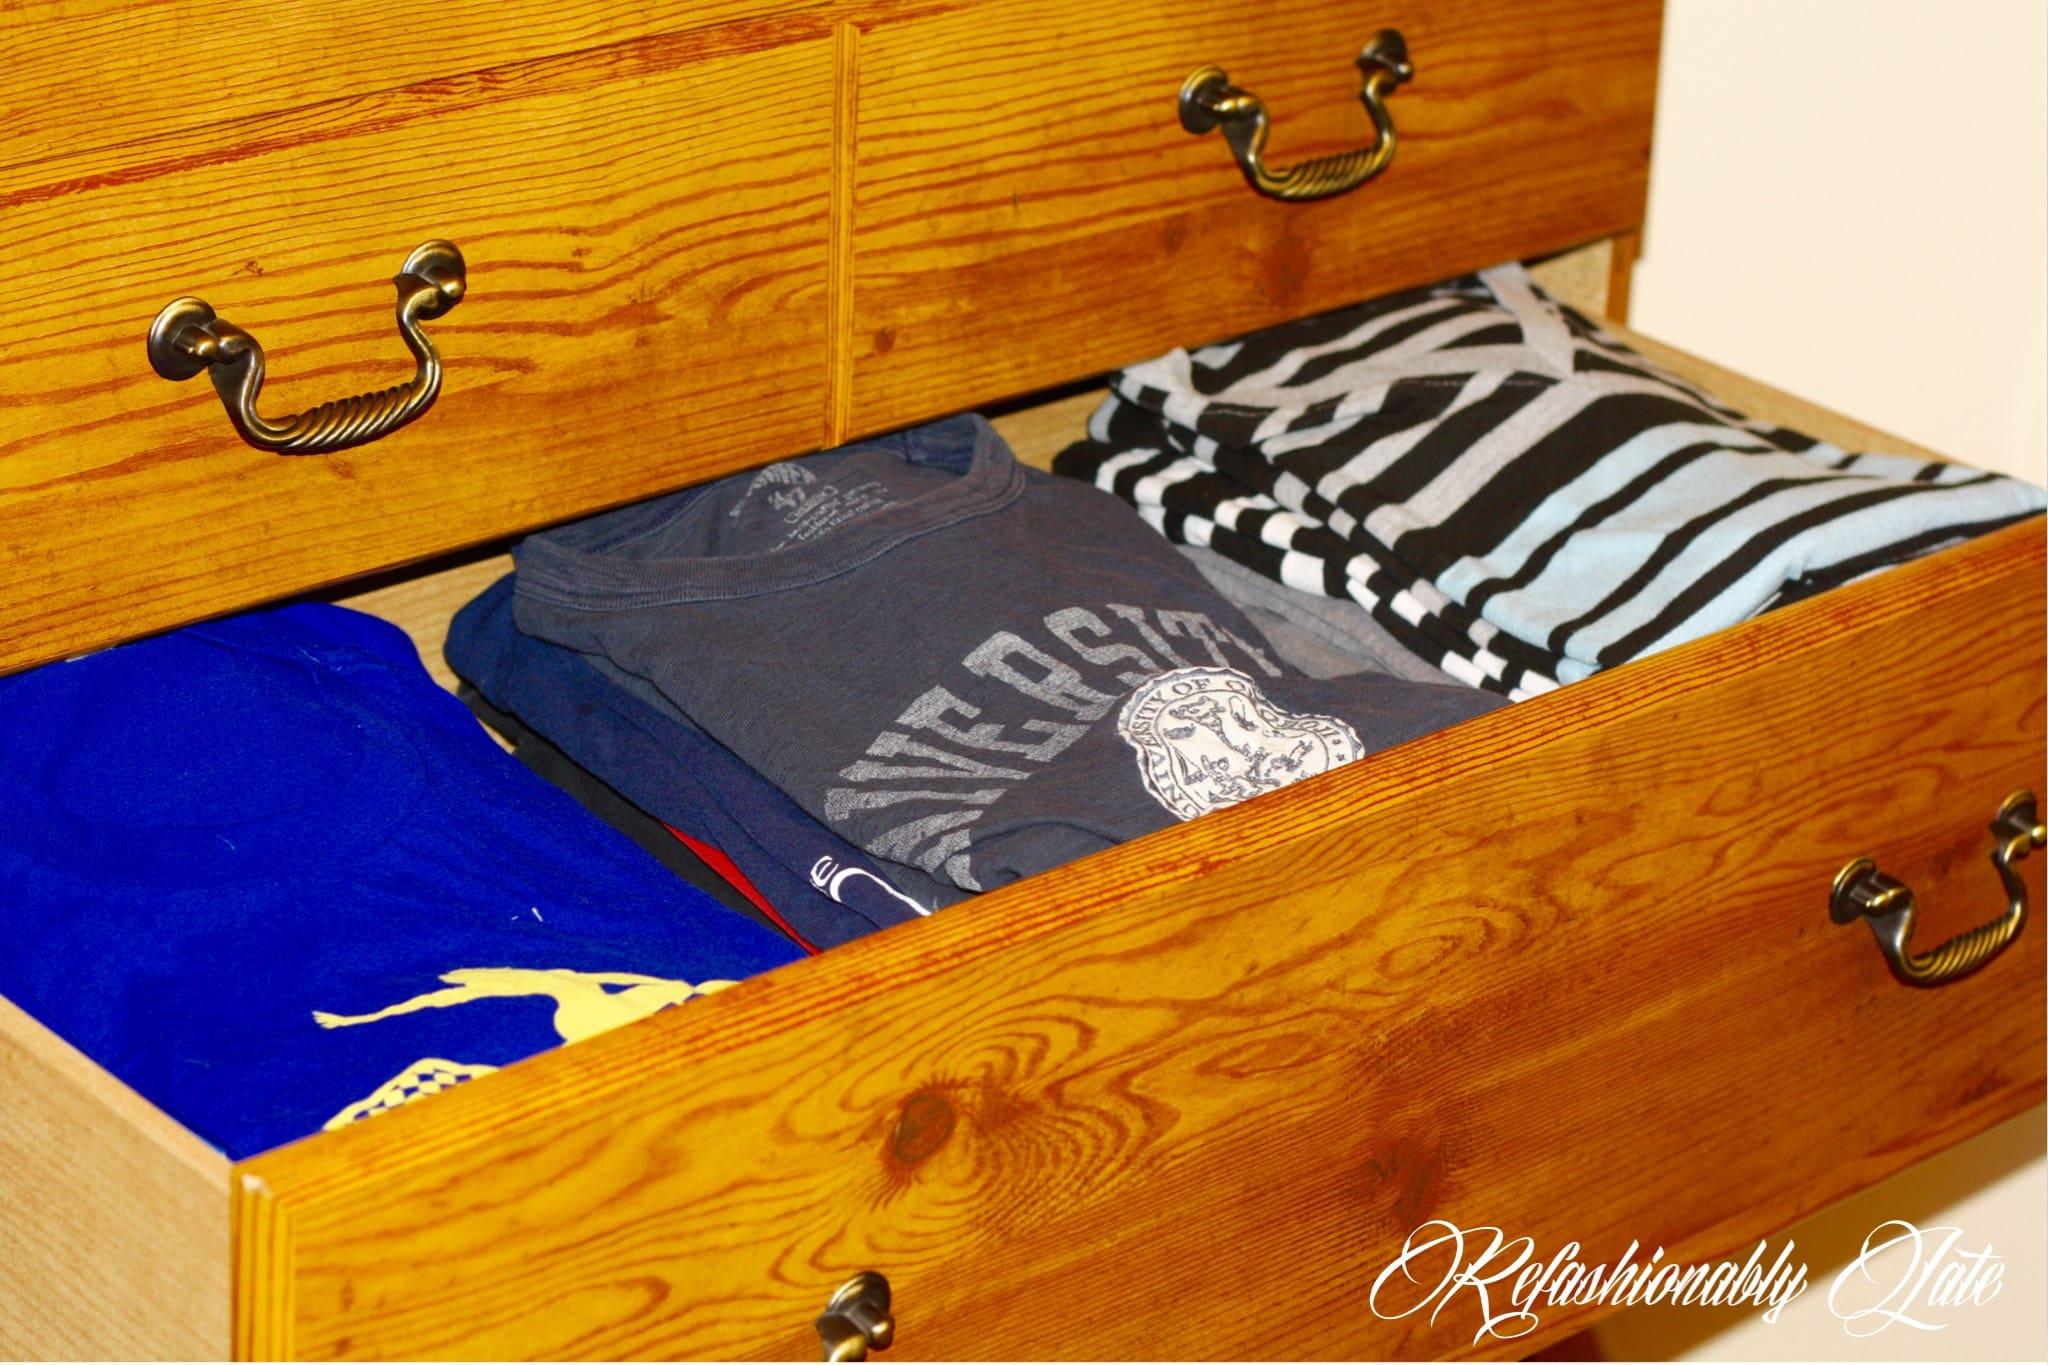 How to Fold Shirts Perfectly Every Time - www.refashionablylate.com